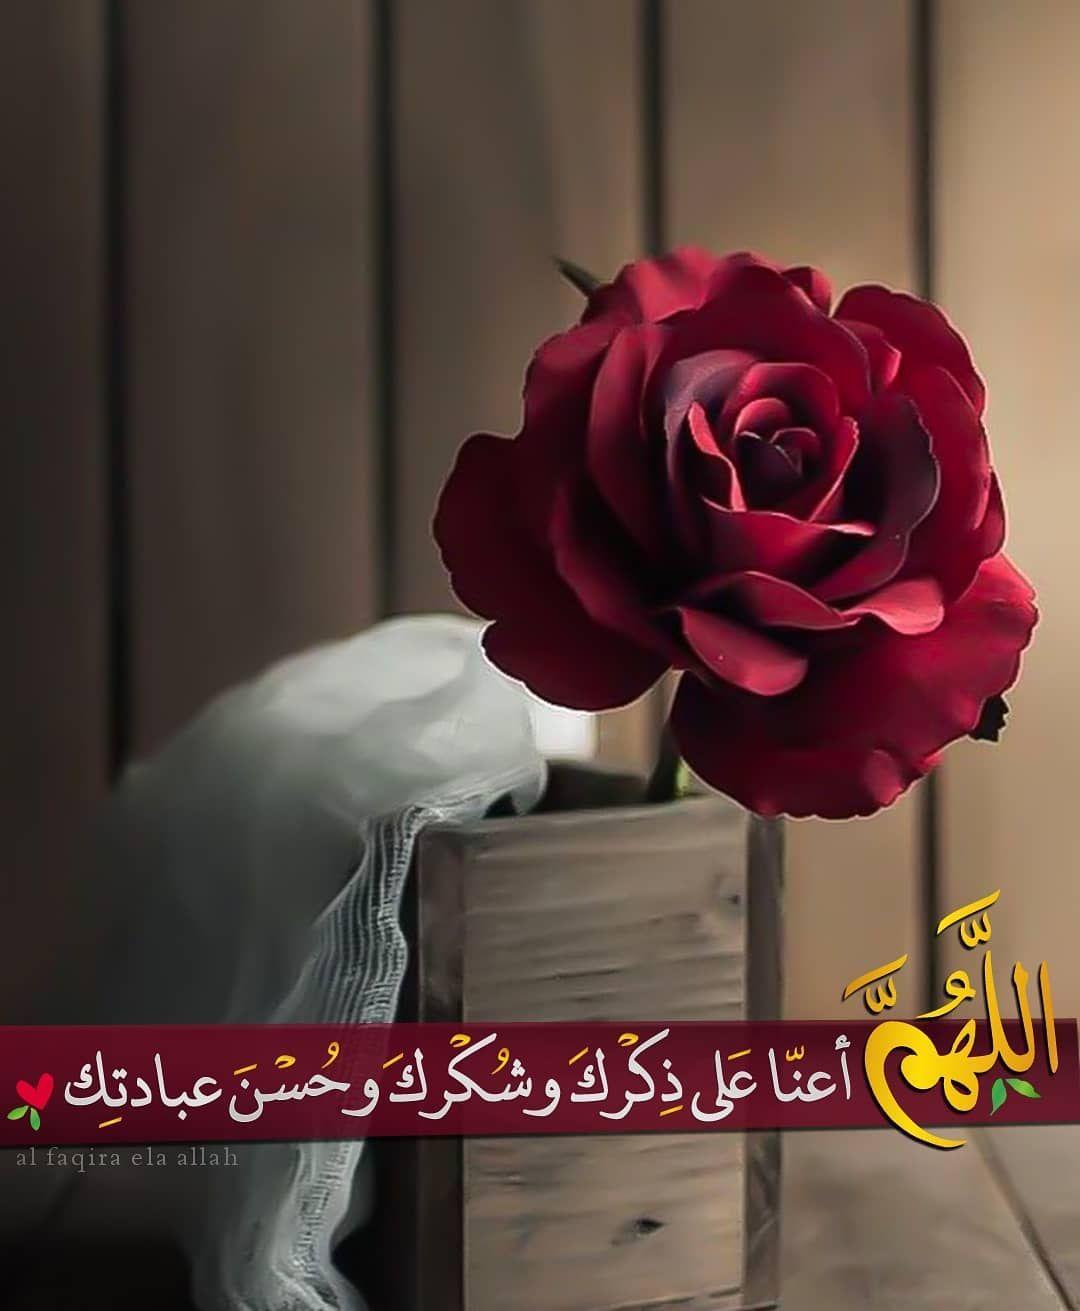 Pin By Taha Awad On دعاء تسبيح إستغفار Islamic Wallpaper Islamic Pictures Islamic Dua